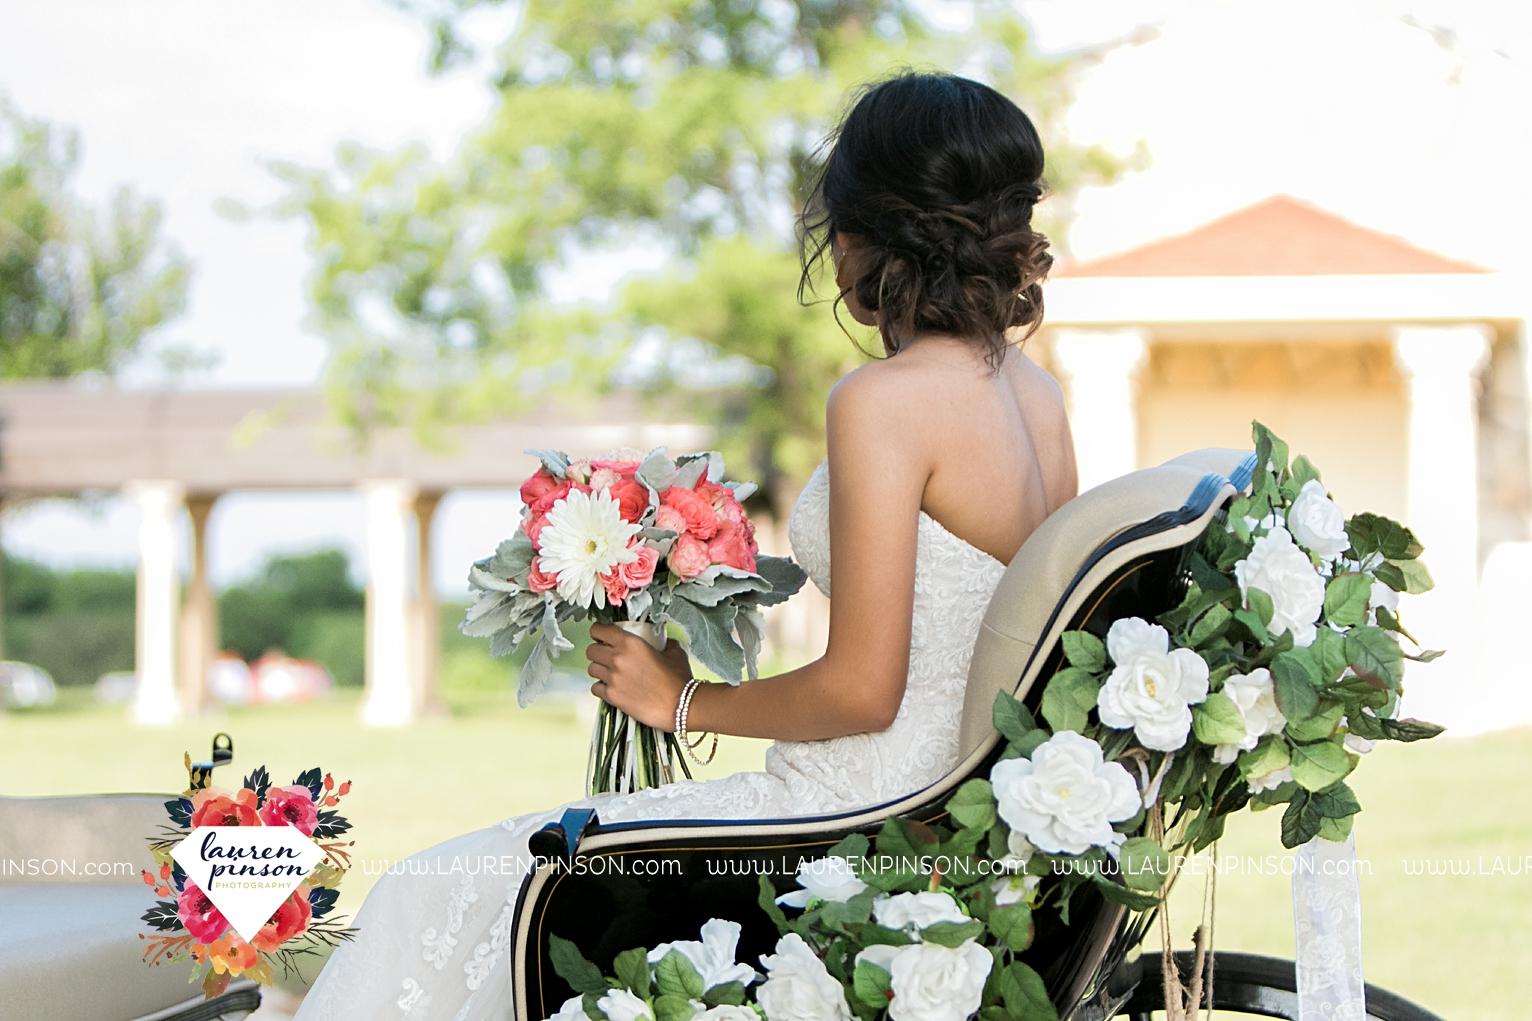 wichita-falls-wedding-nocona-comanche-rose-ranch-rustic-pink-gray-photography-00133.jpg